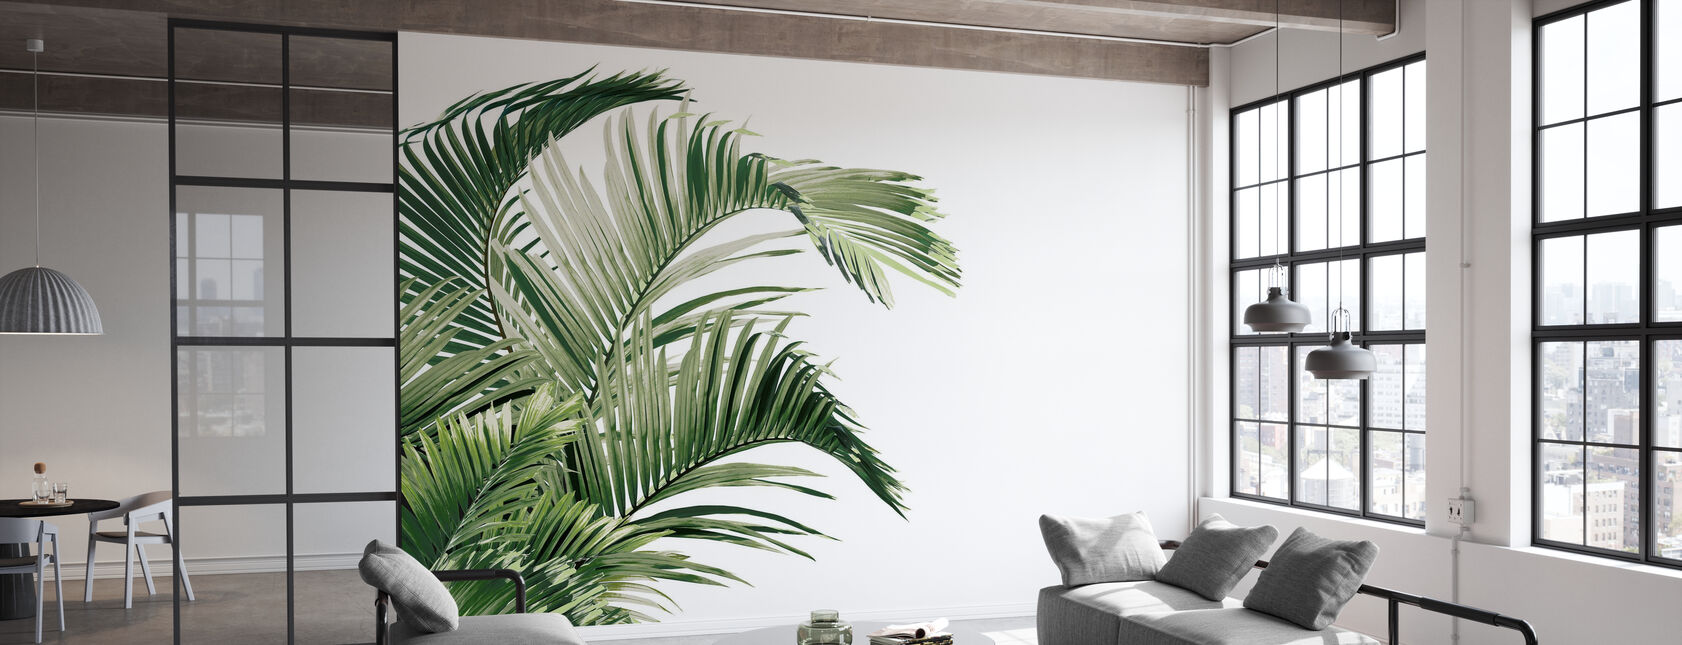 Piece of Paradise - Viridescent - Papier peint - Bureau